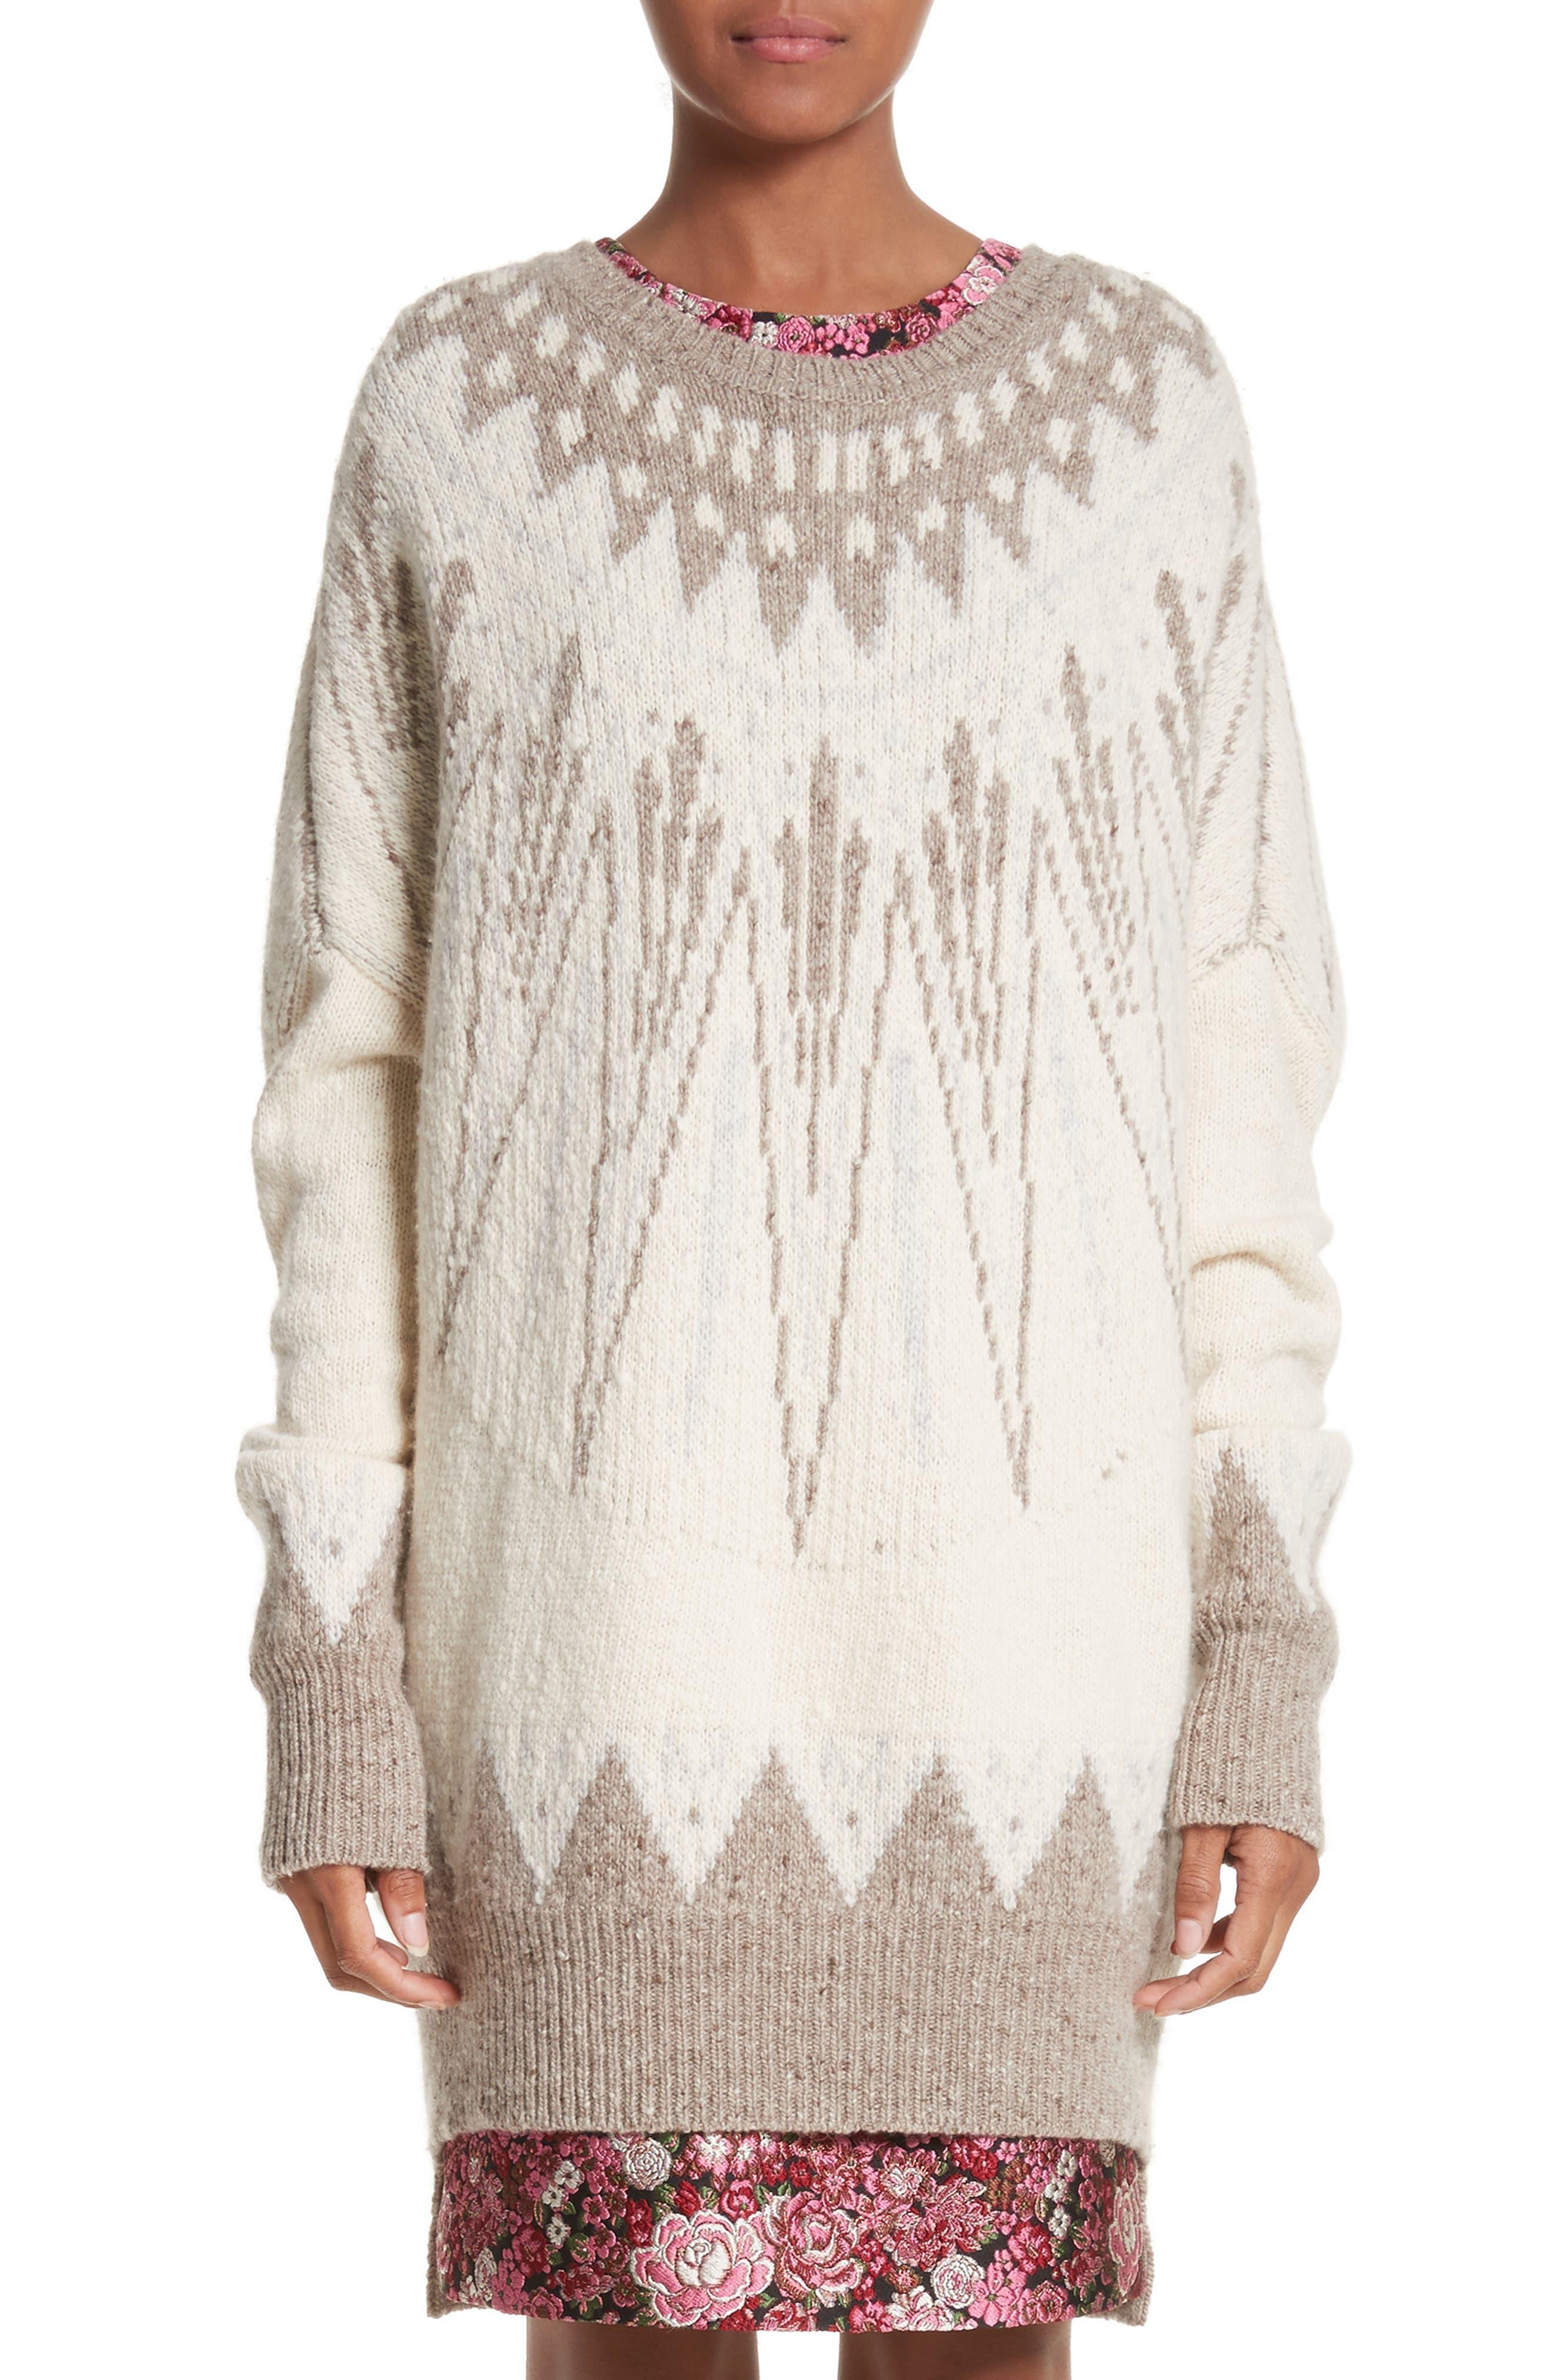 Marled Merino Wool & Cashmere Fair Isle Sweater,                         Main,                         color, 900